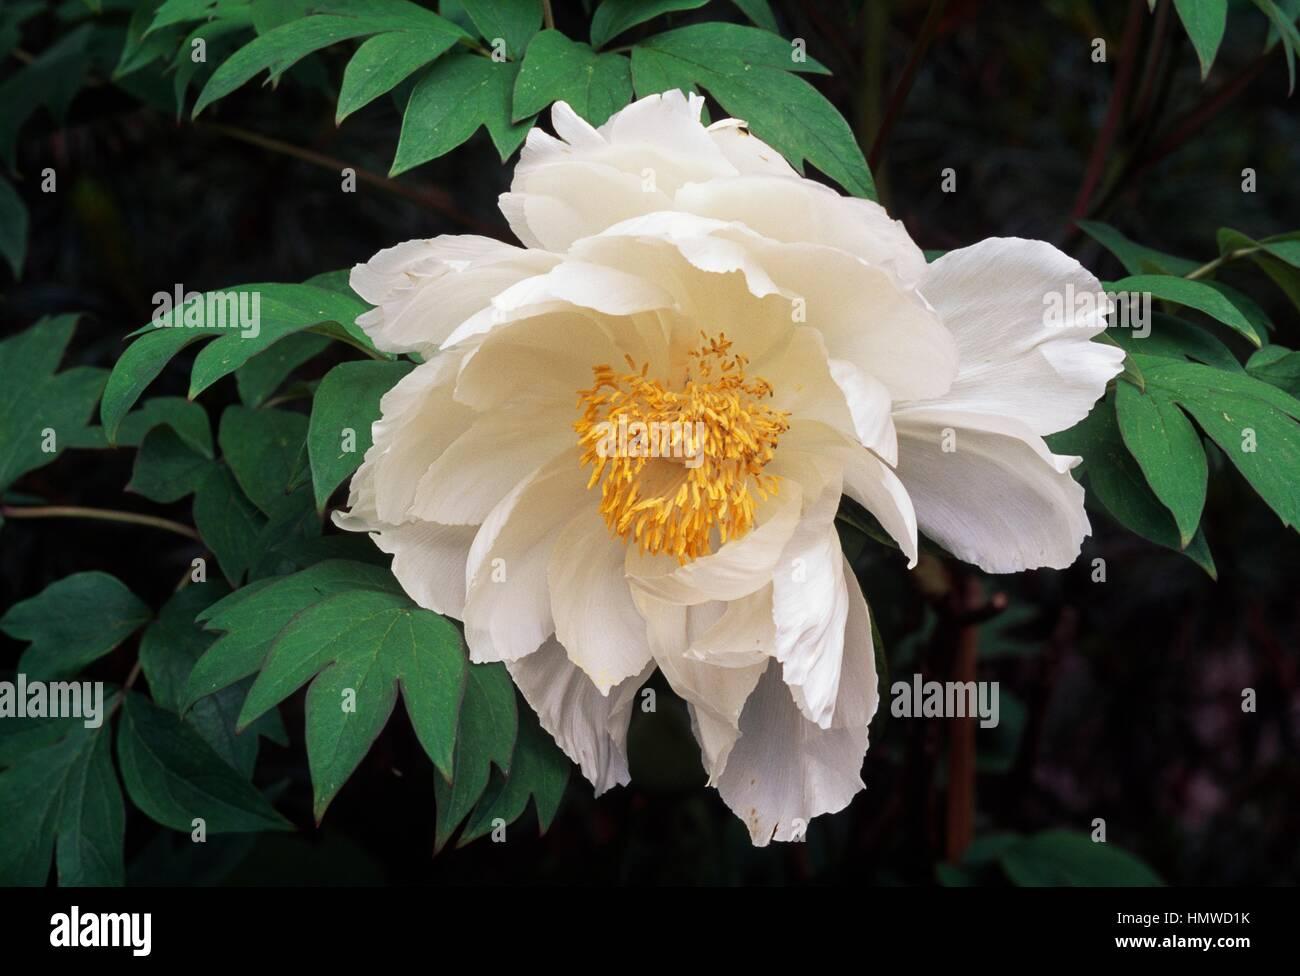 Himalayan peony (Paeonia emodi), Paeoniaceae. - Stock Image